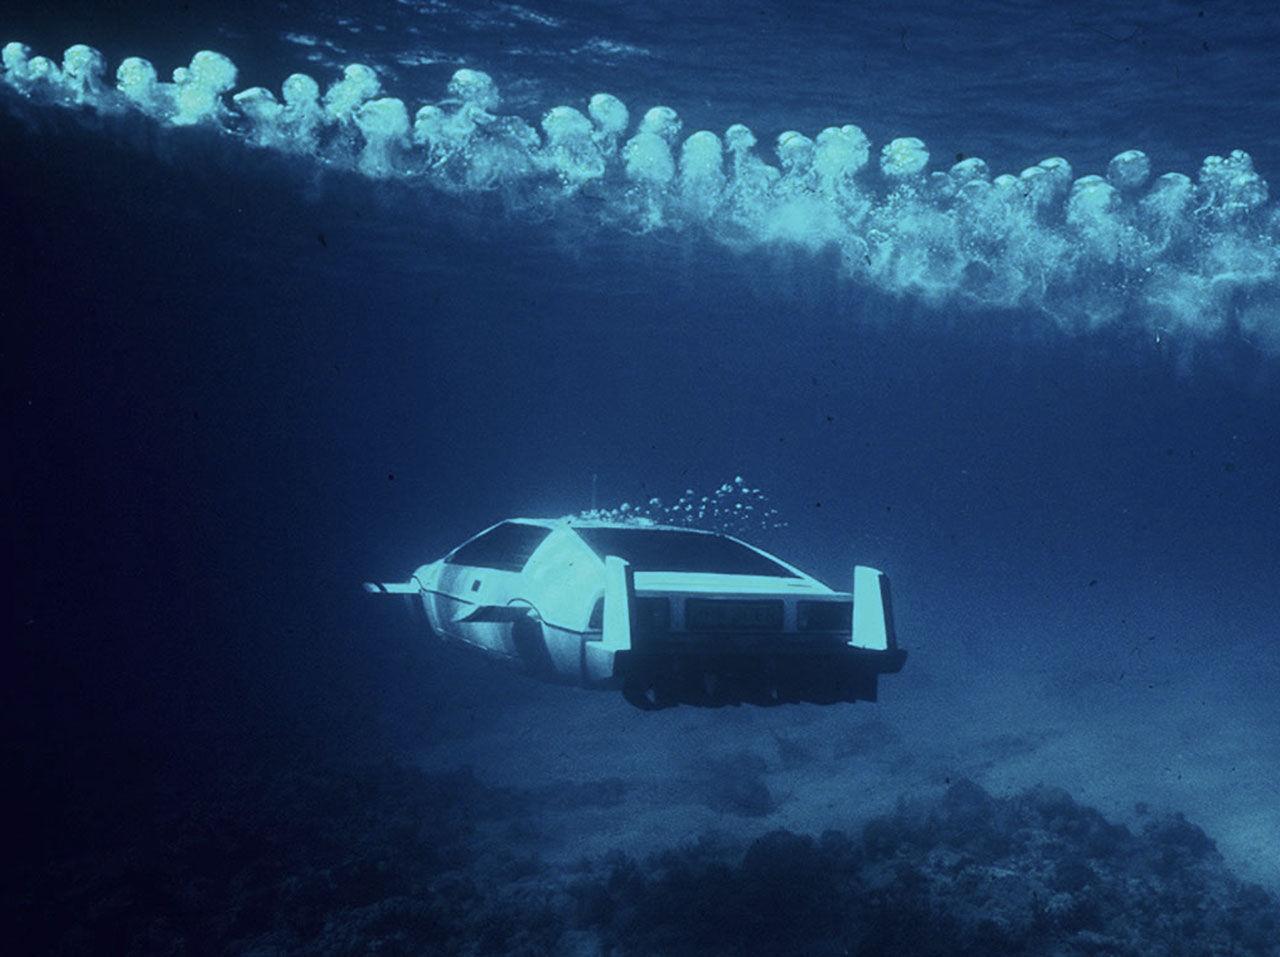 Bonds Lotus-ubåt går under klubban